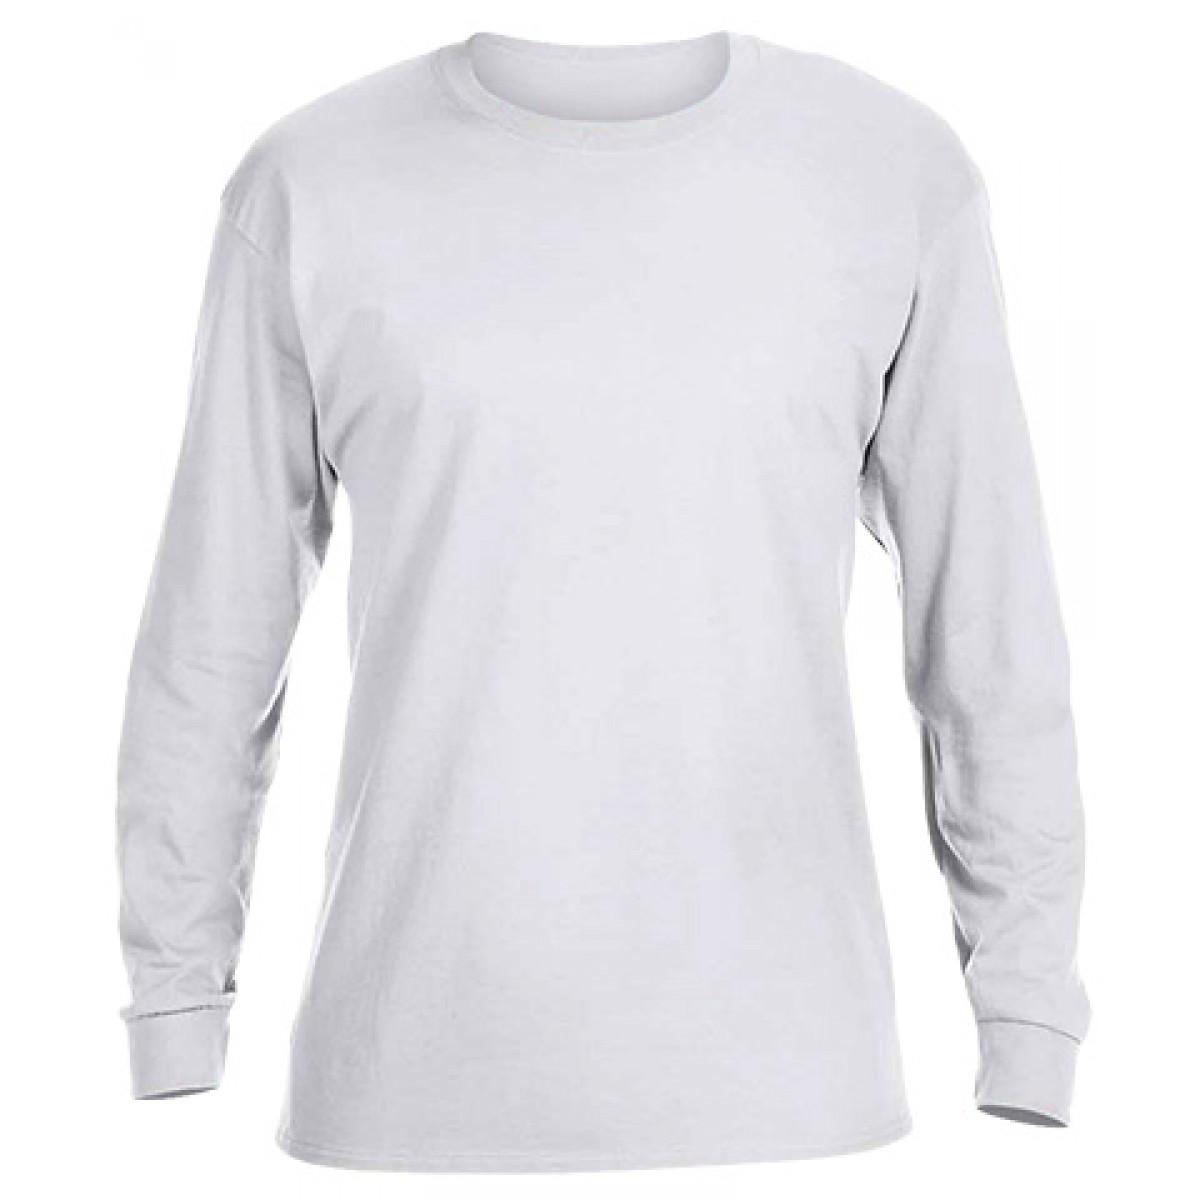 Ultra Cotton Long-Sleeve T-Shirt-White-YM